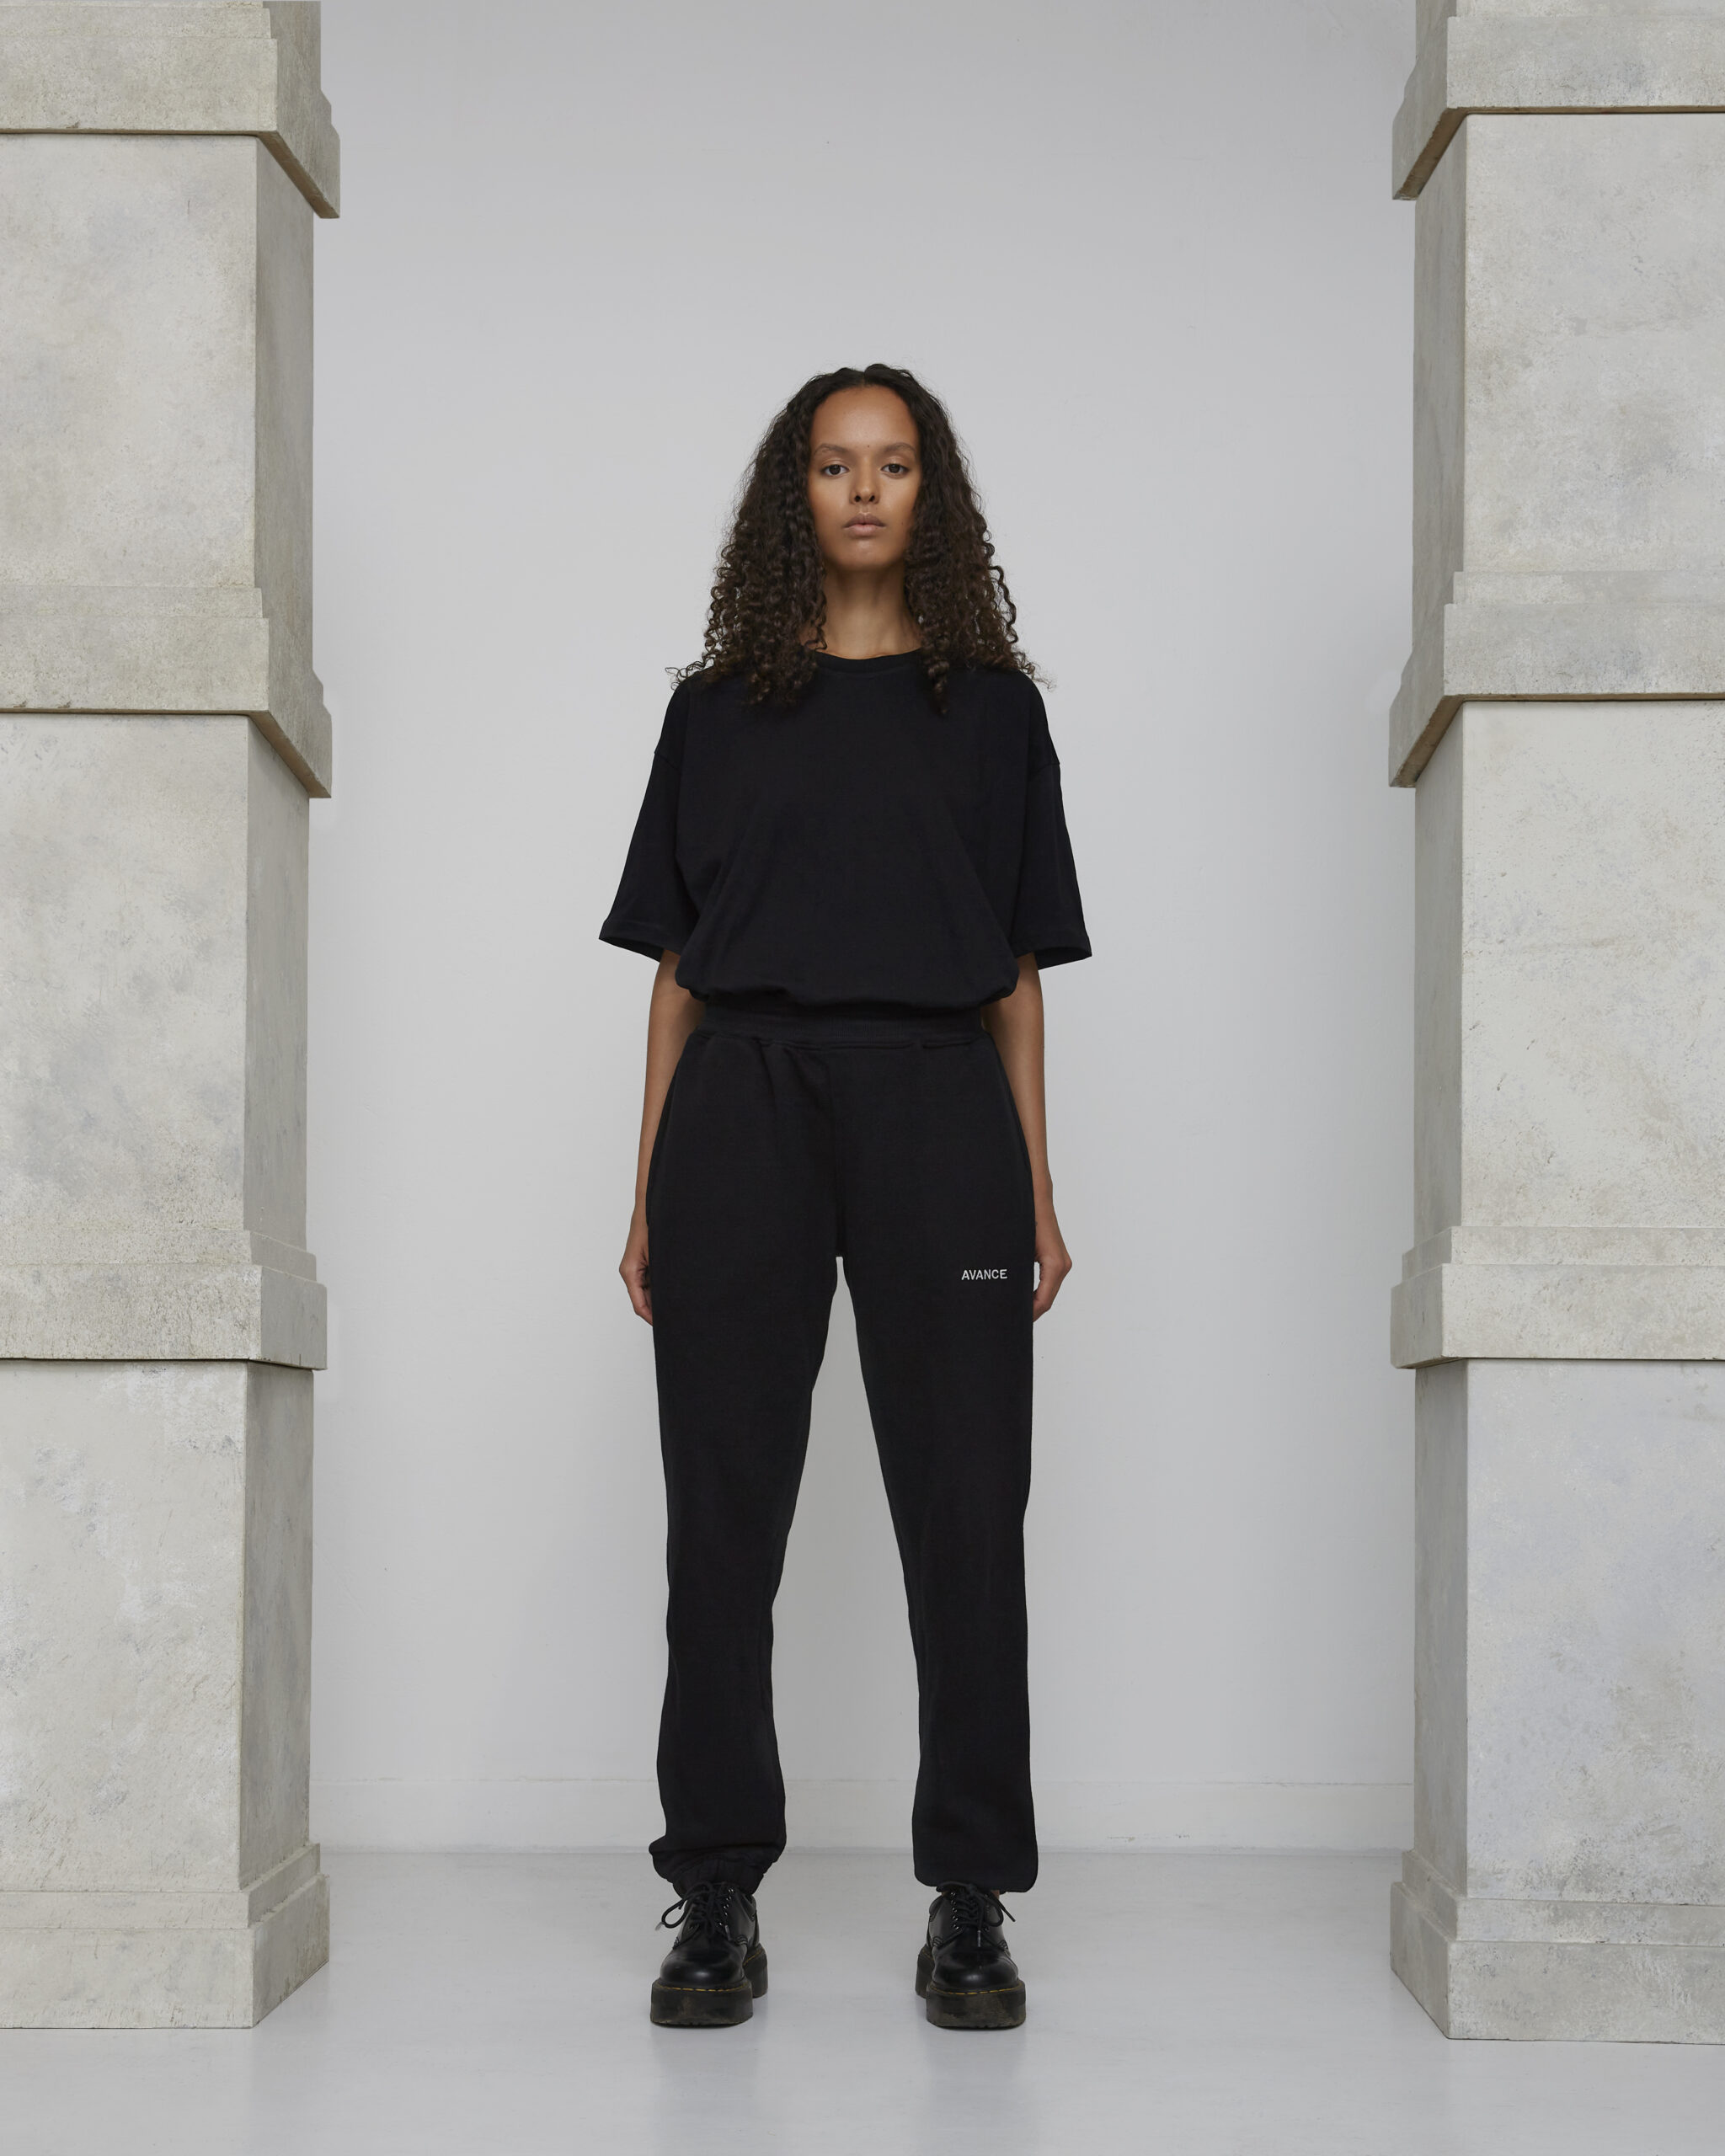 Avance t-shirt black